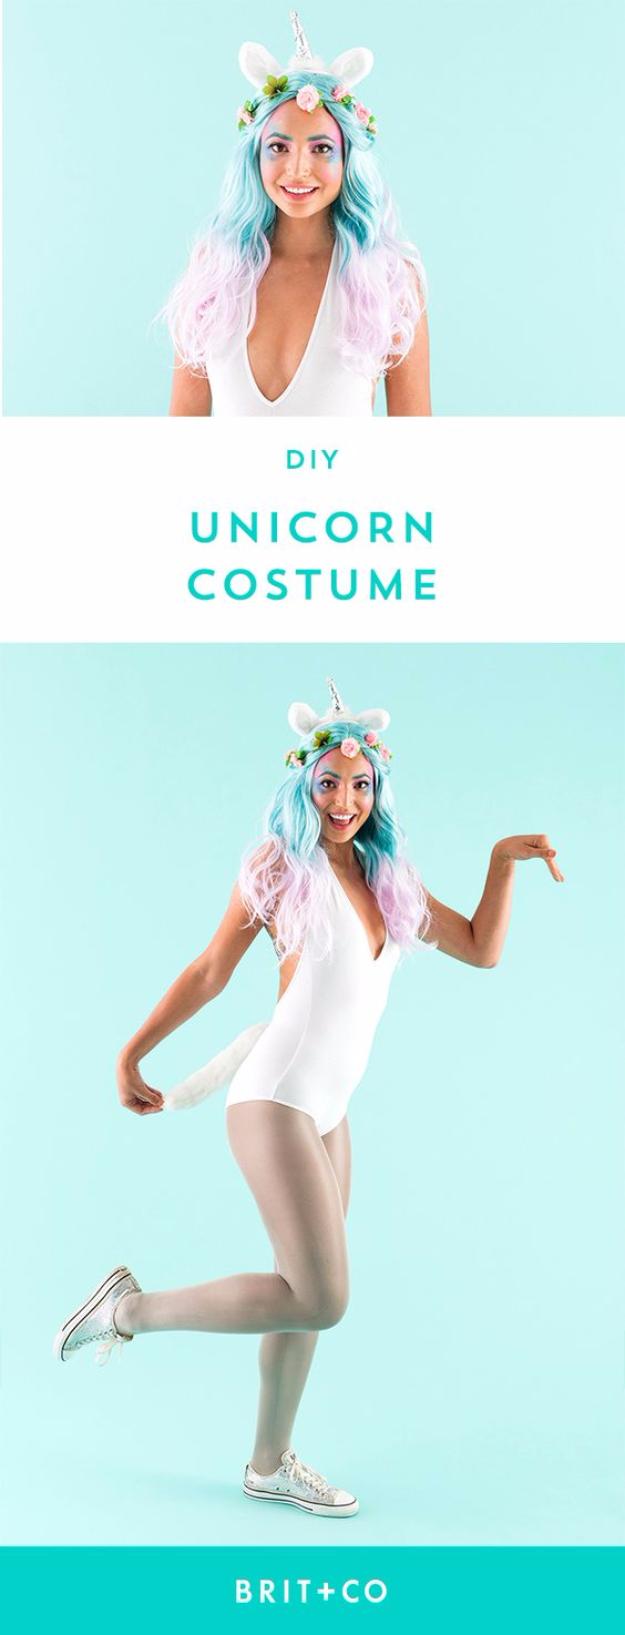 30 Creative Diy Halloween Costume Ideas